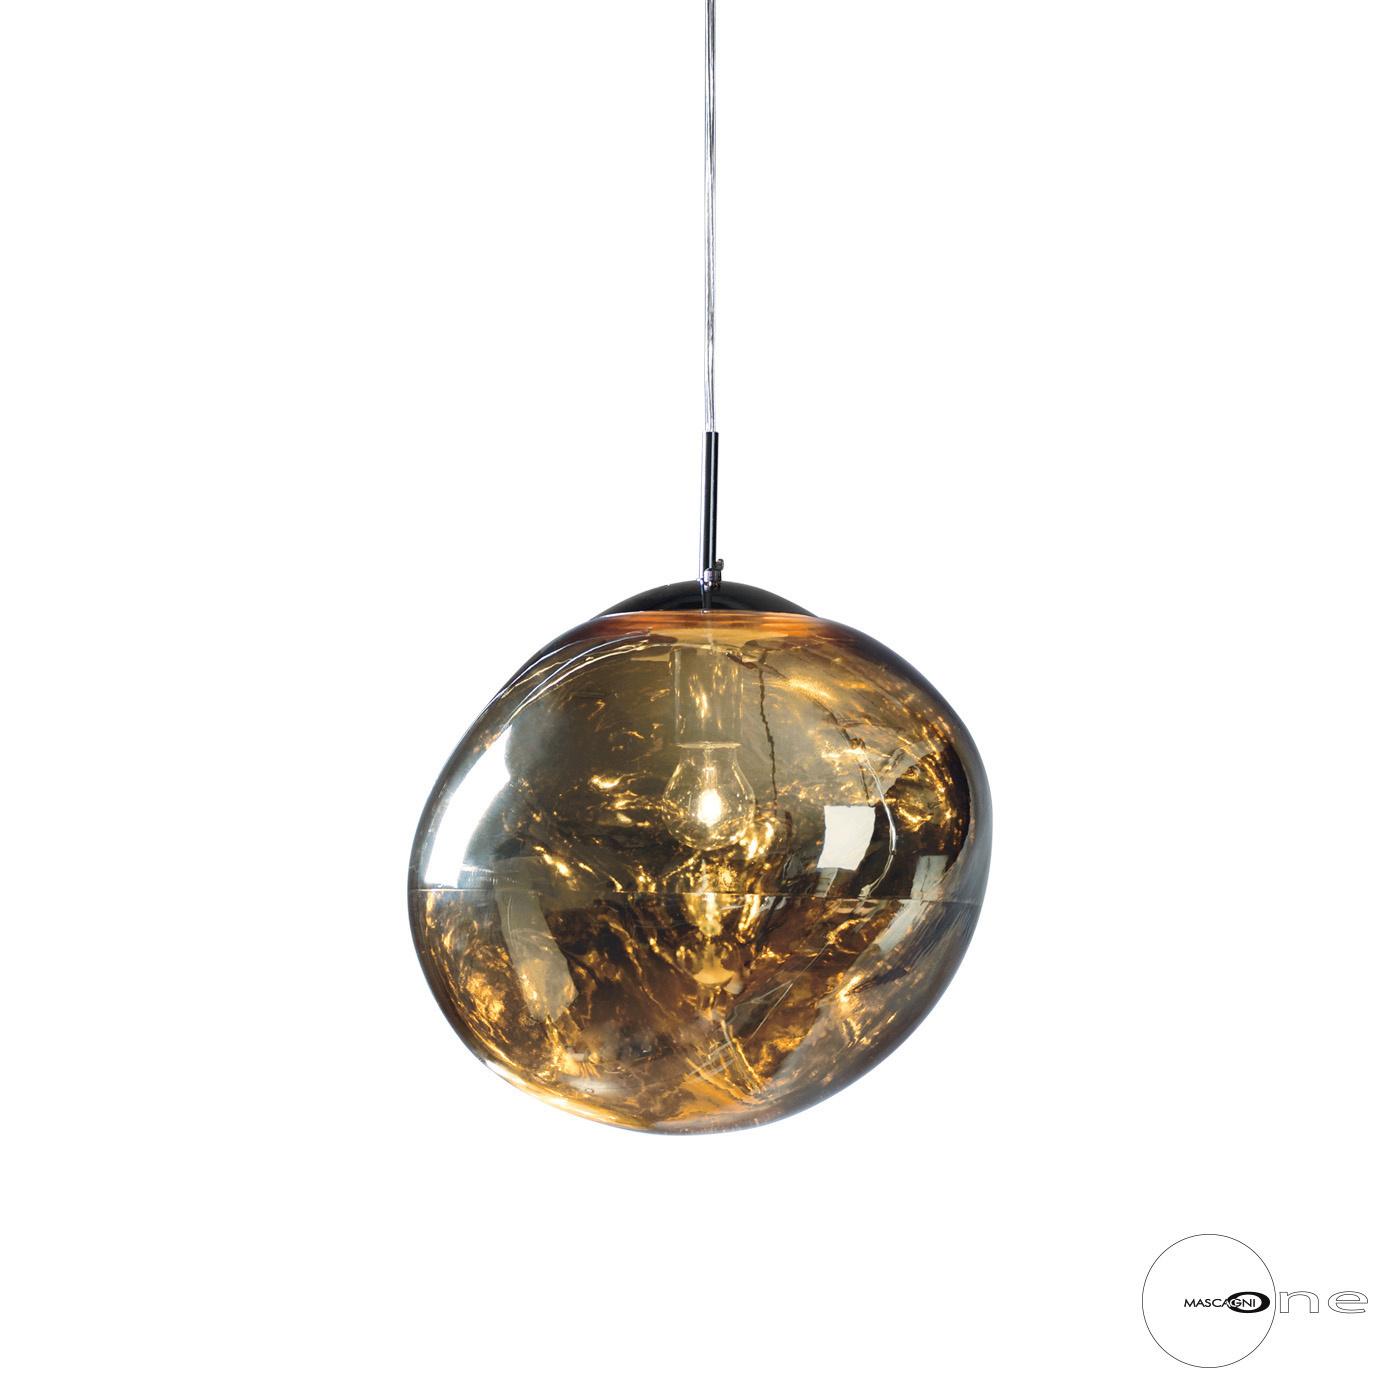 Art Mascagni O1490 CEILING LAMP DIAM.28 - COL.GOLD